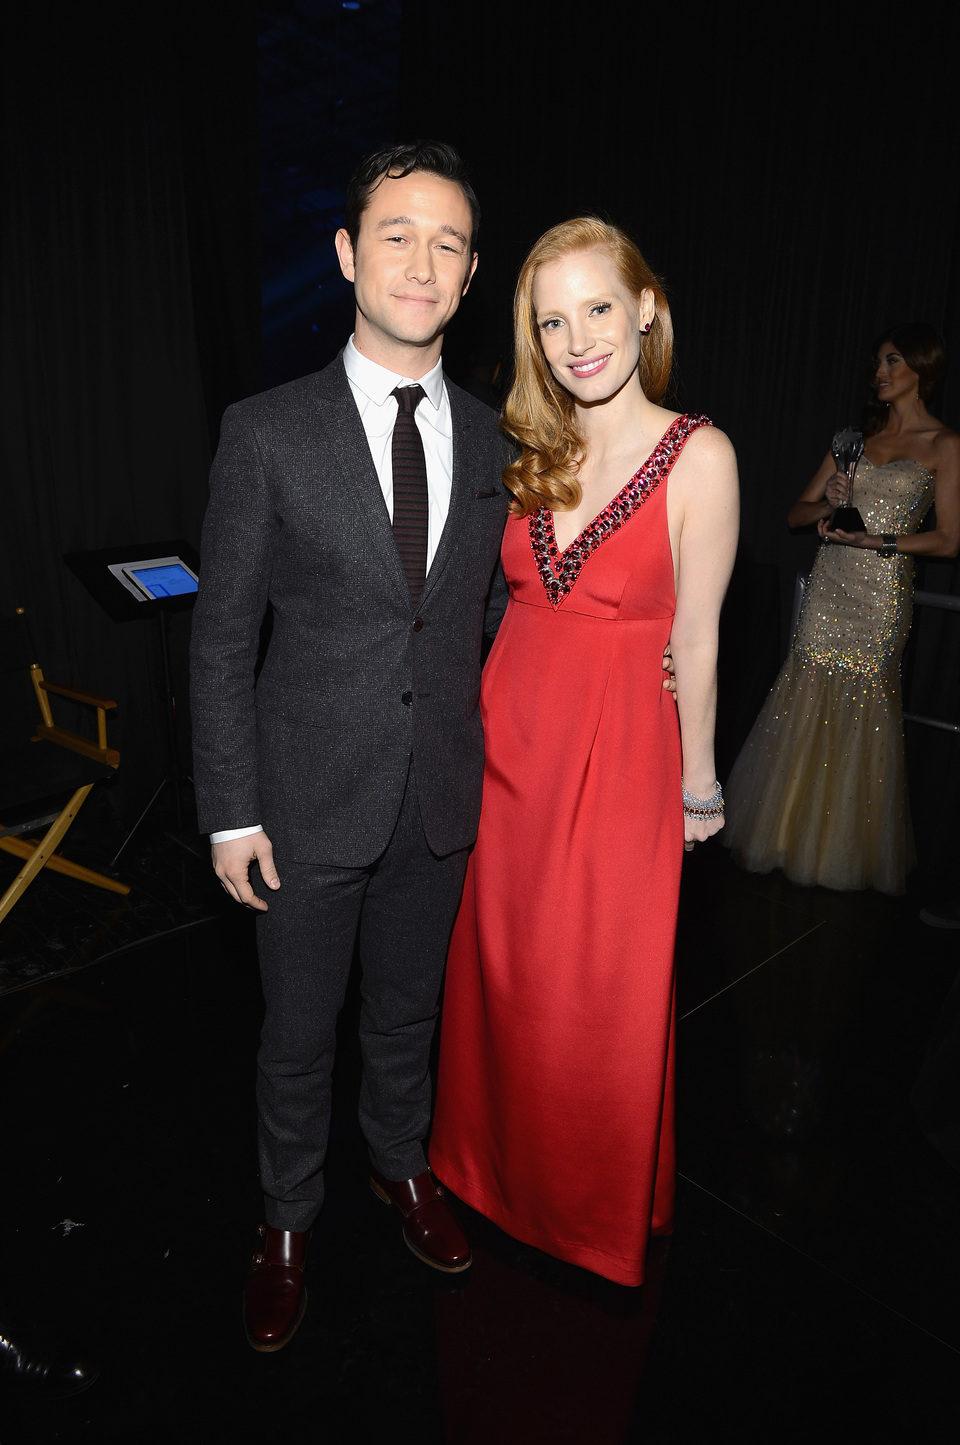 Joseph Gordon-Levitt y Jessica Chastain en la gala de los Critics' Choice Movie Awards 2013